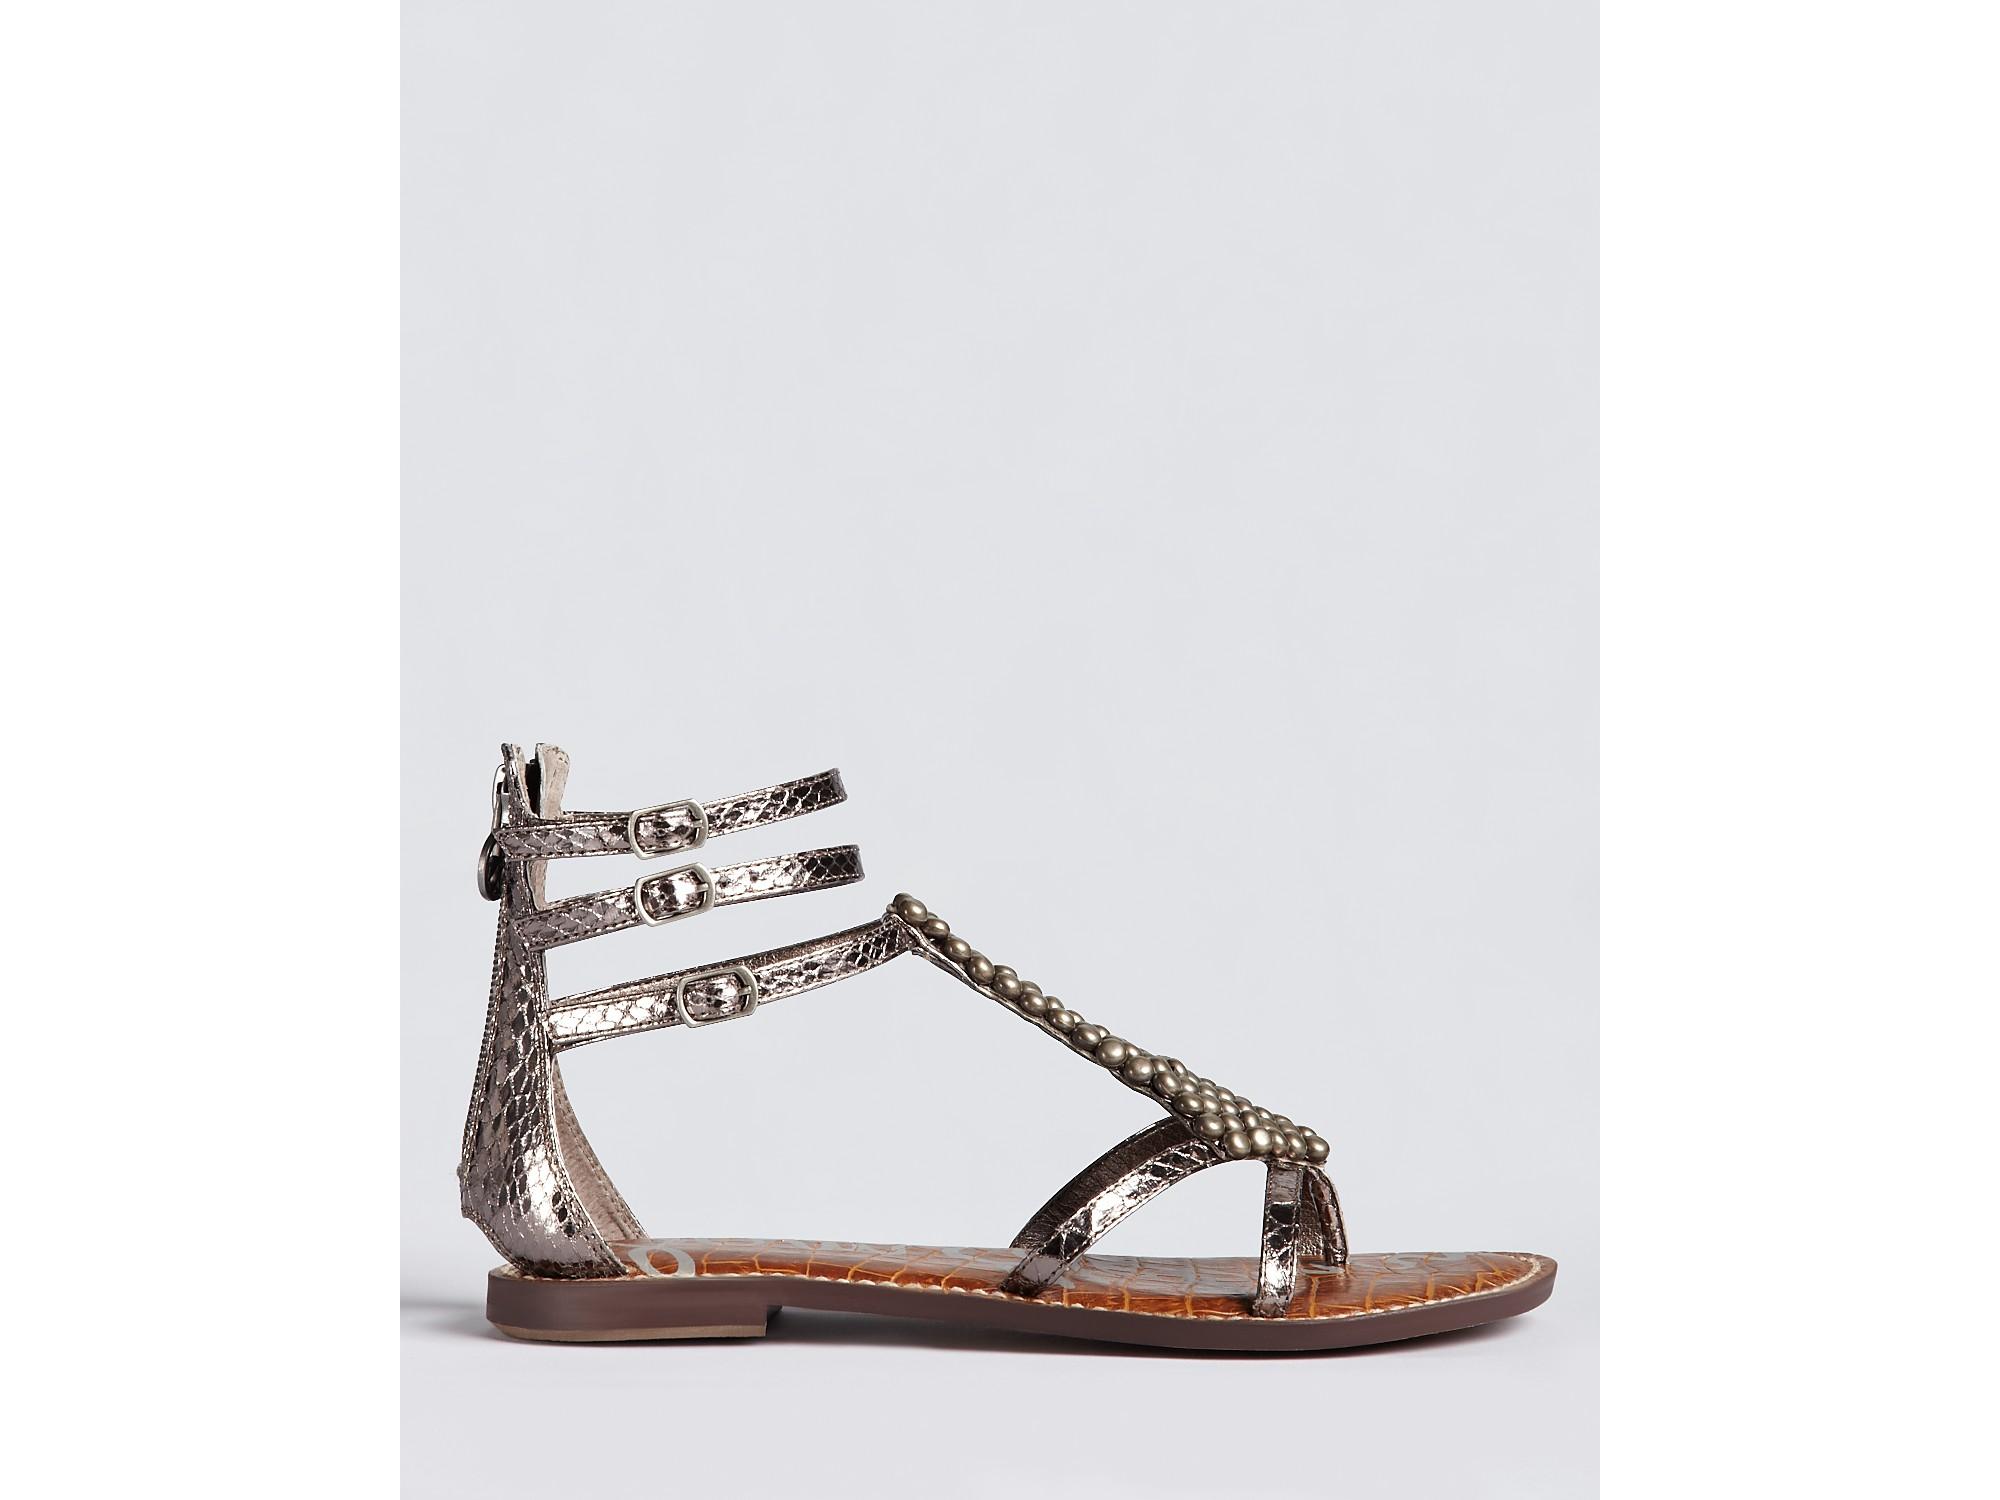 bc90ebb3d27 Lyst - Sam Edelman Sandals Ginger in Metallic